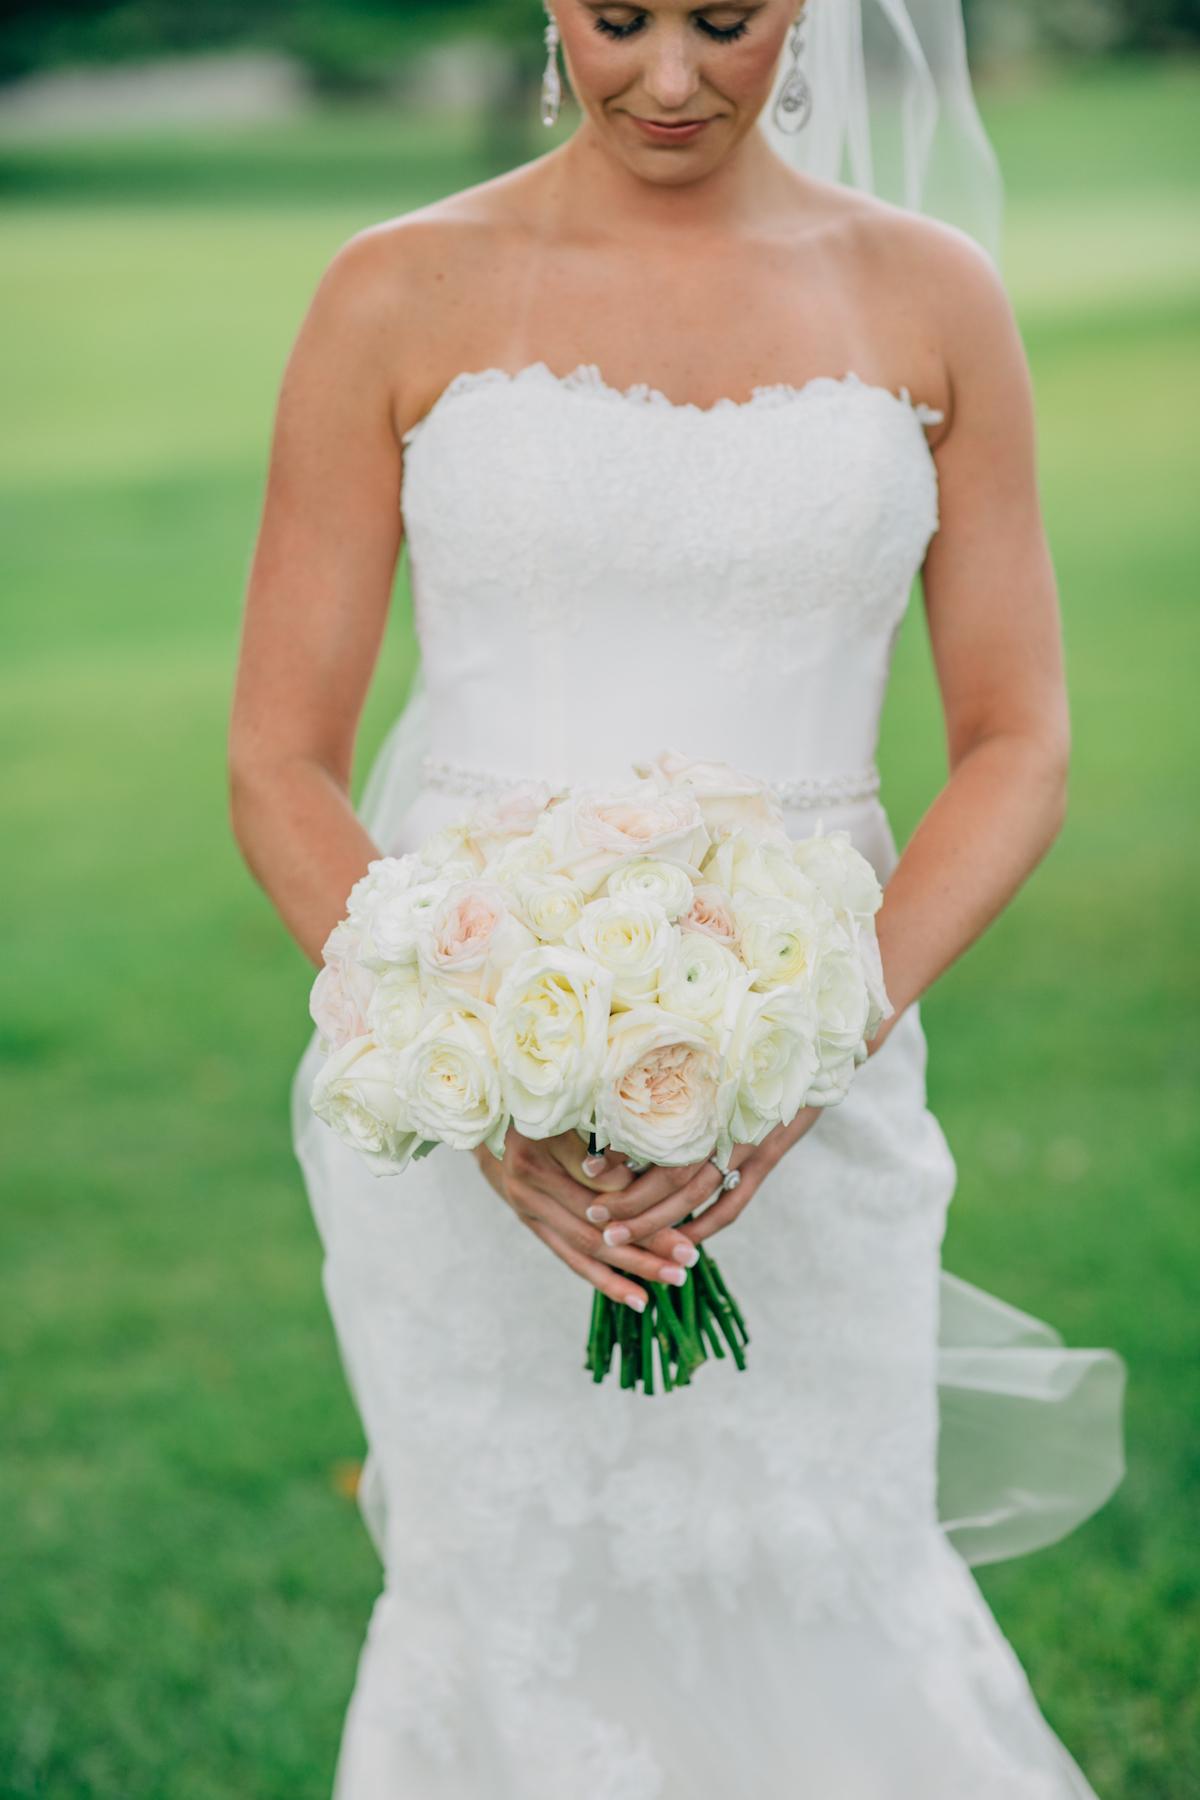 engle-olson-mark-fierst-minnesota-wedding-10.jpg